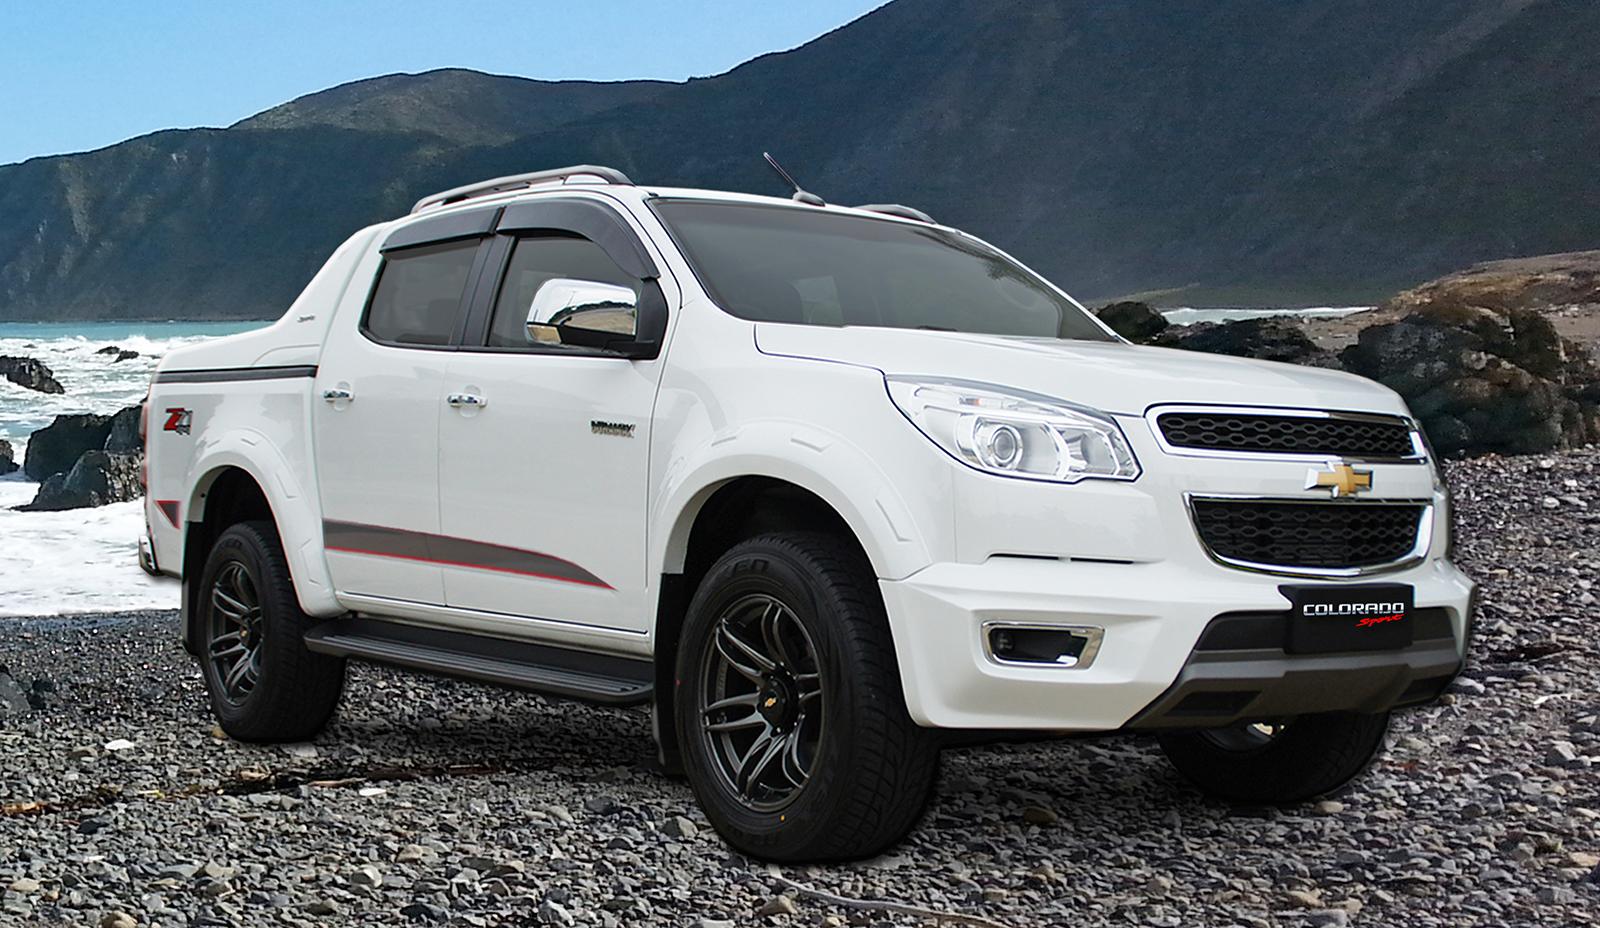 Chevrolet Colorado konsep prebiu bagi facelift Image 461455